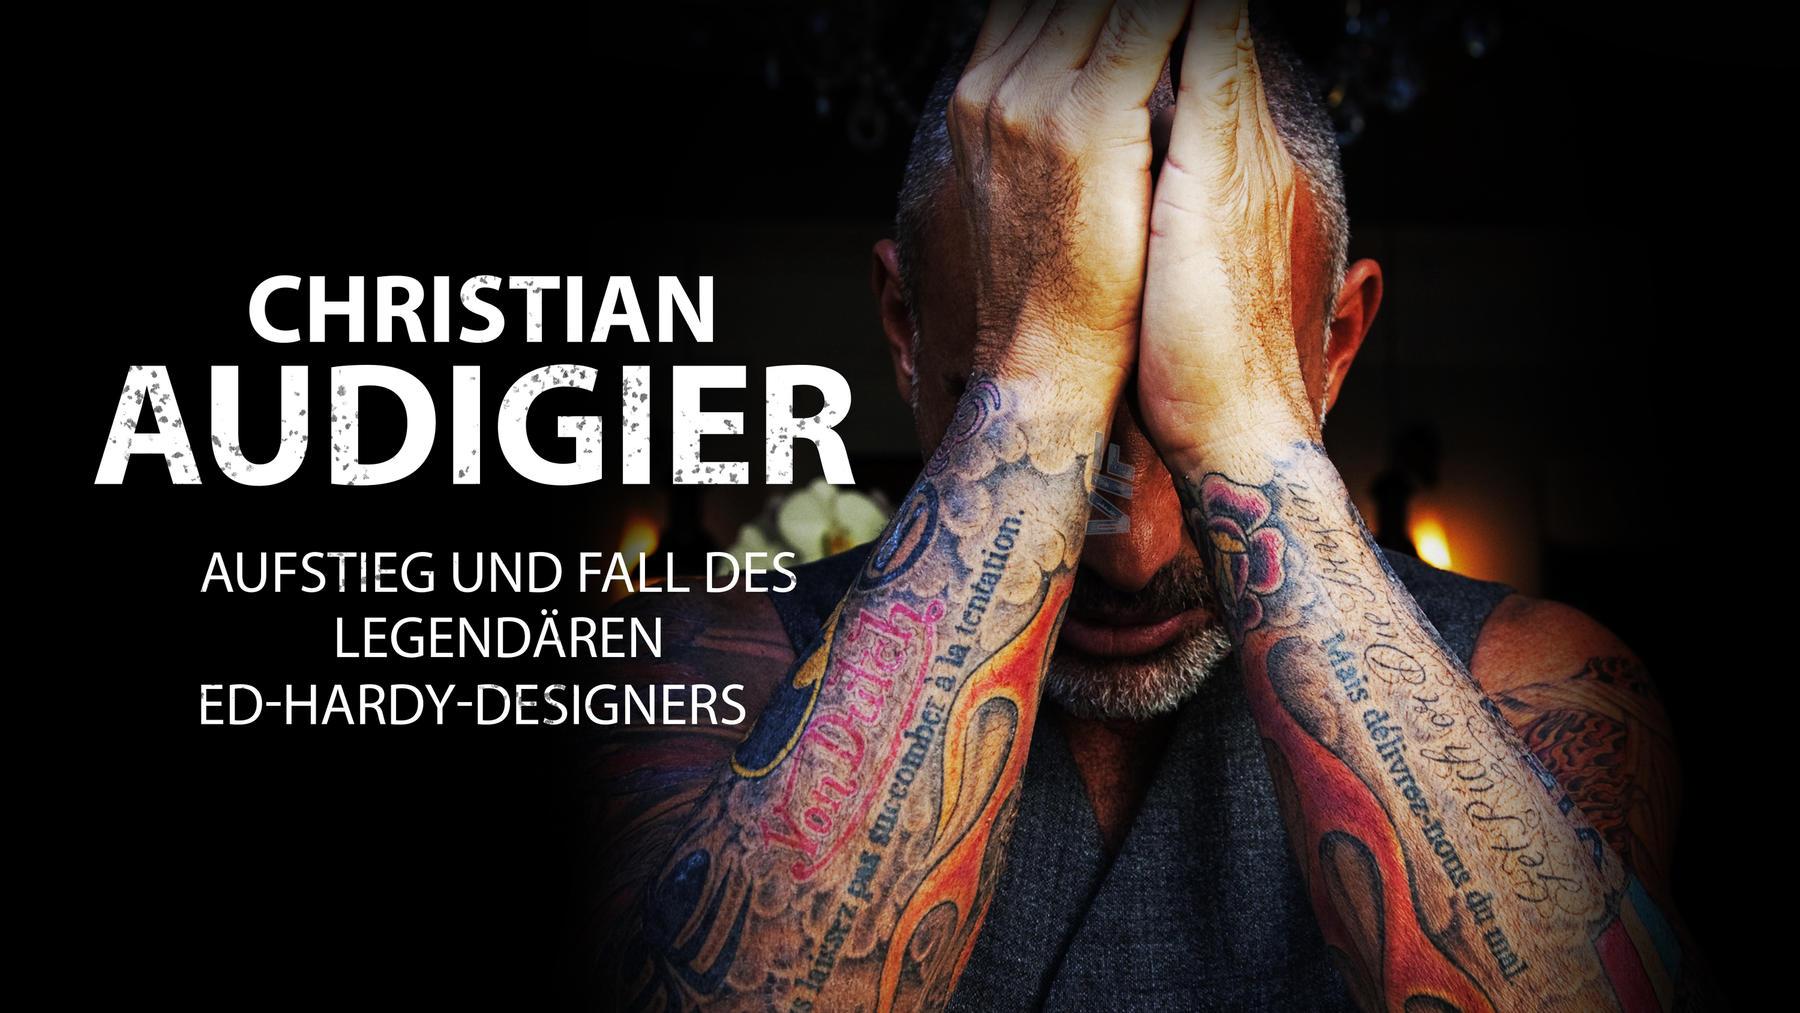 Christian Audigier - Aufstieg und Fall des legendären Ed-Hardy-Designers